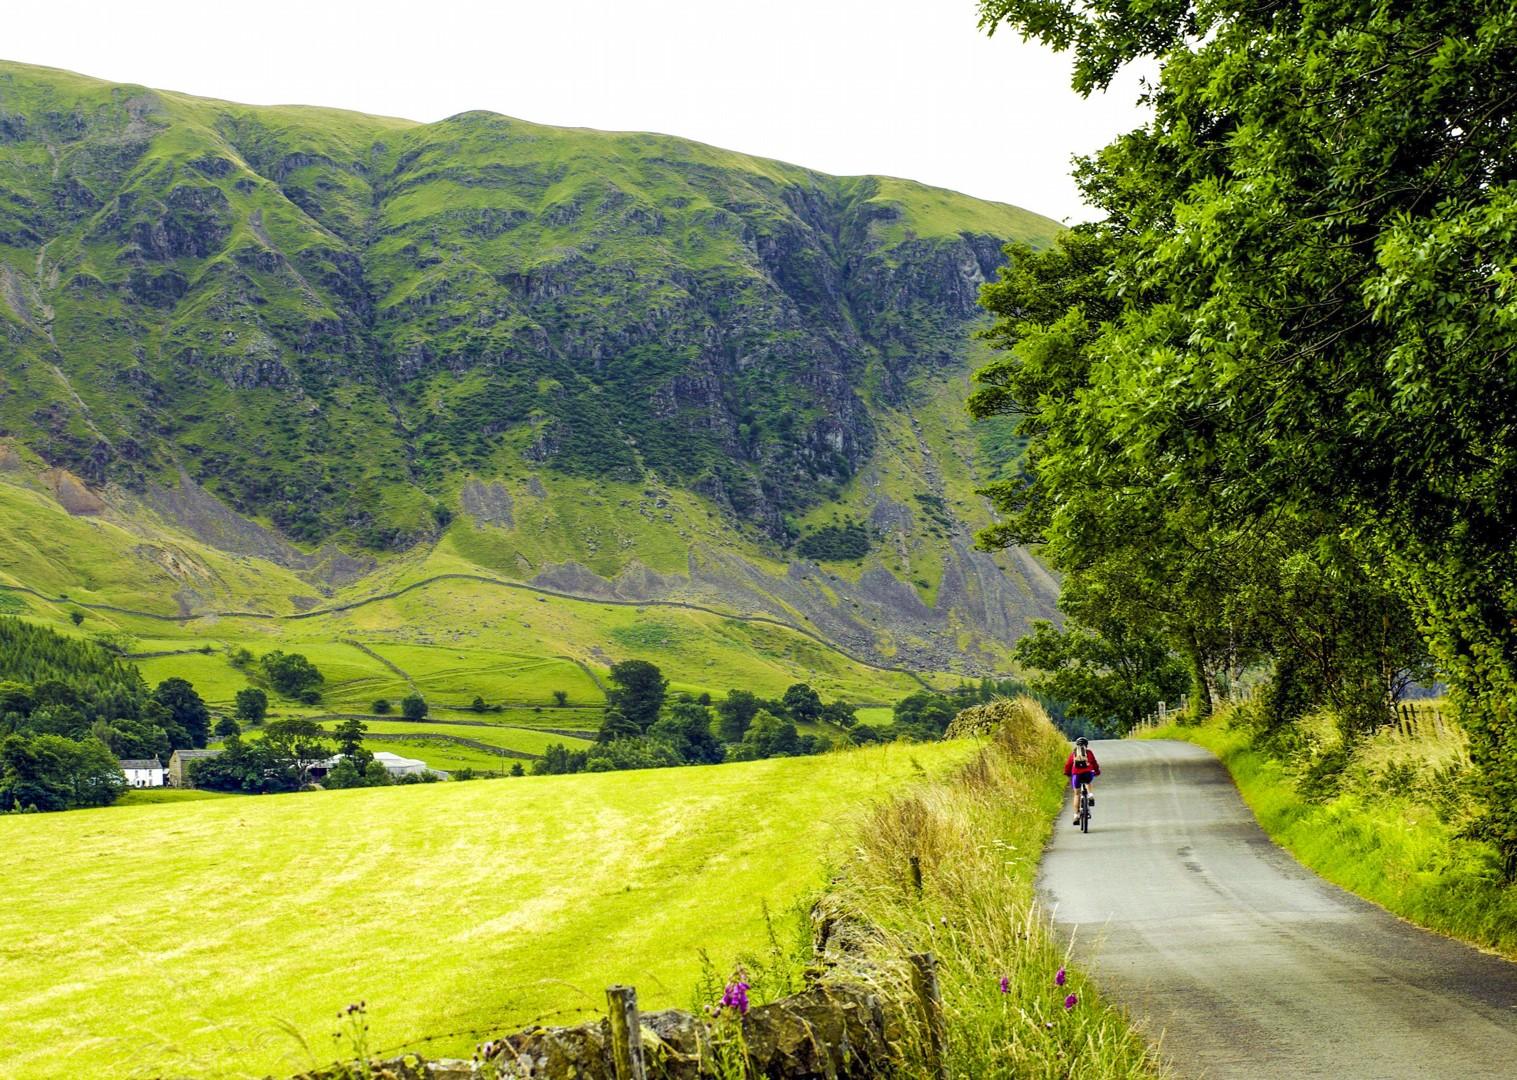 cycling-tour-leisure-bike-holiday-beautiful-uk.jpg - UK - C2C - Coast to Coast 4 Days Cycling - Self-Guided Leisure Cycling Holiday - Leisure Cycling